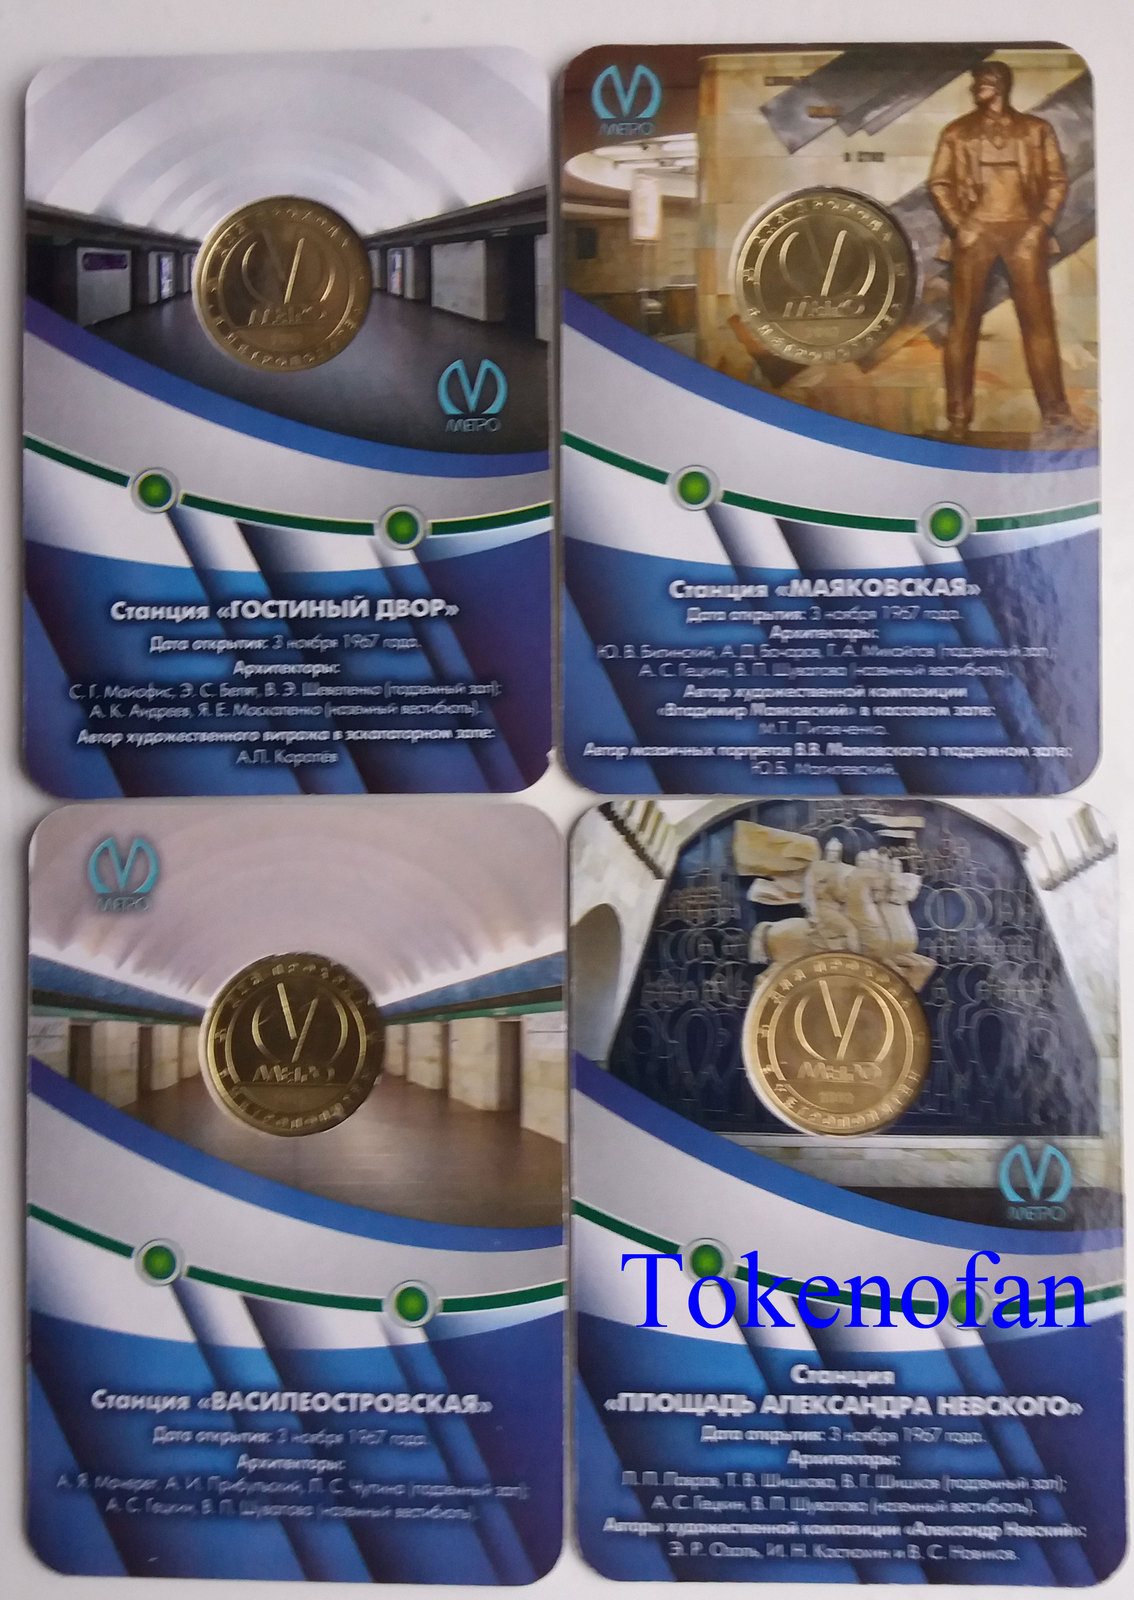 Lot 10 - four latest collectors' Saint-Petersburg subway metro tokens (Russia) image 2